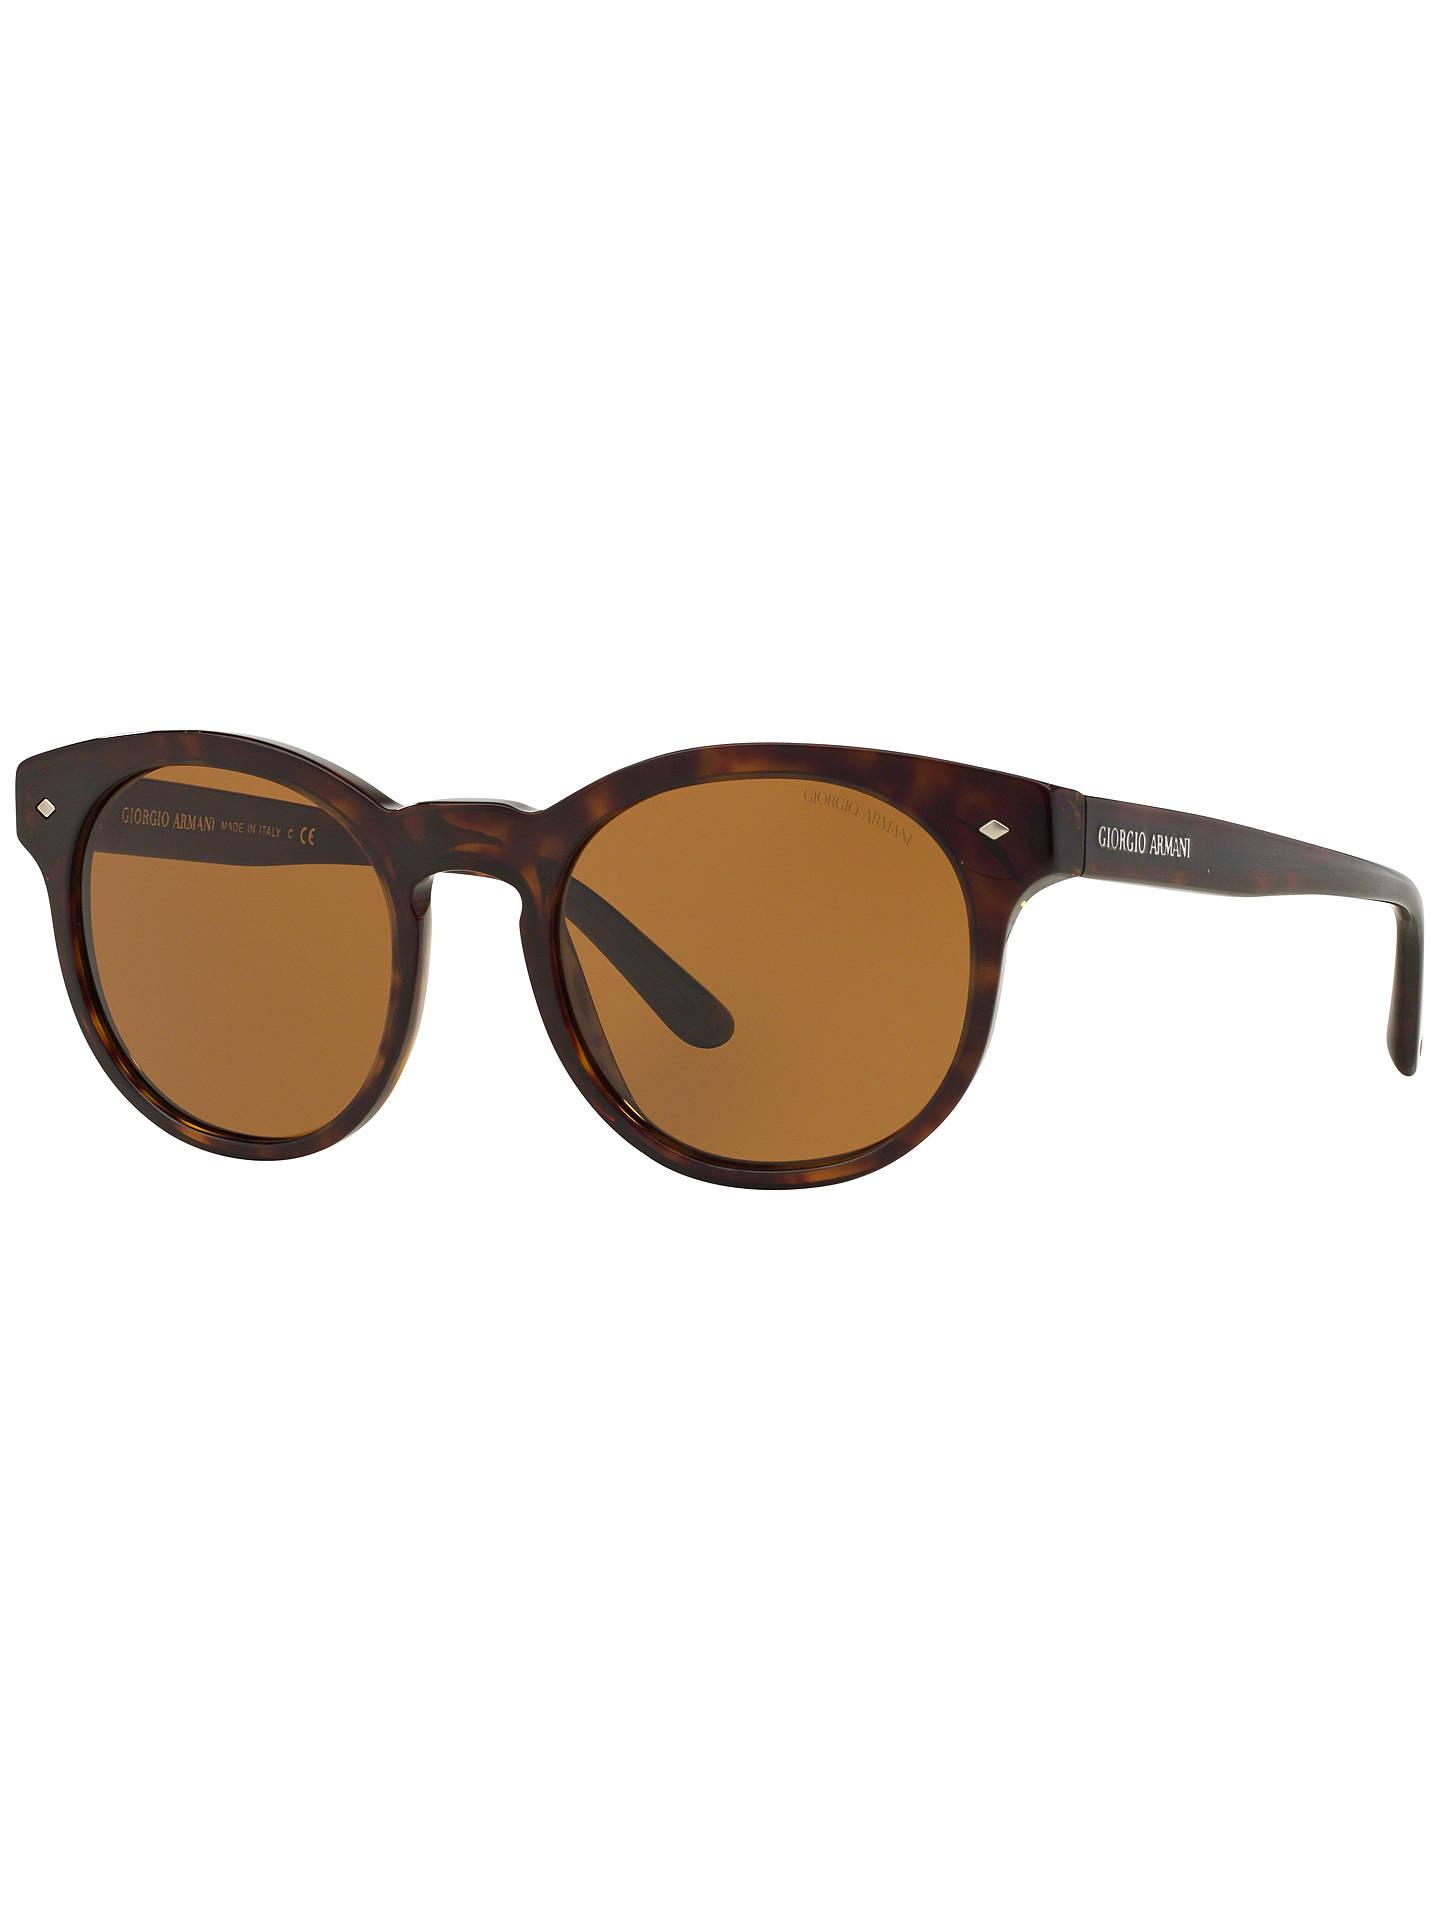 9c1e36e92c Giorgio Armani AR8055 Oval Framed Sunglasses, Tortoise